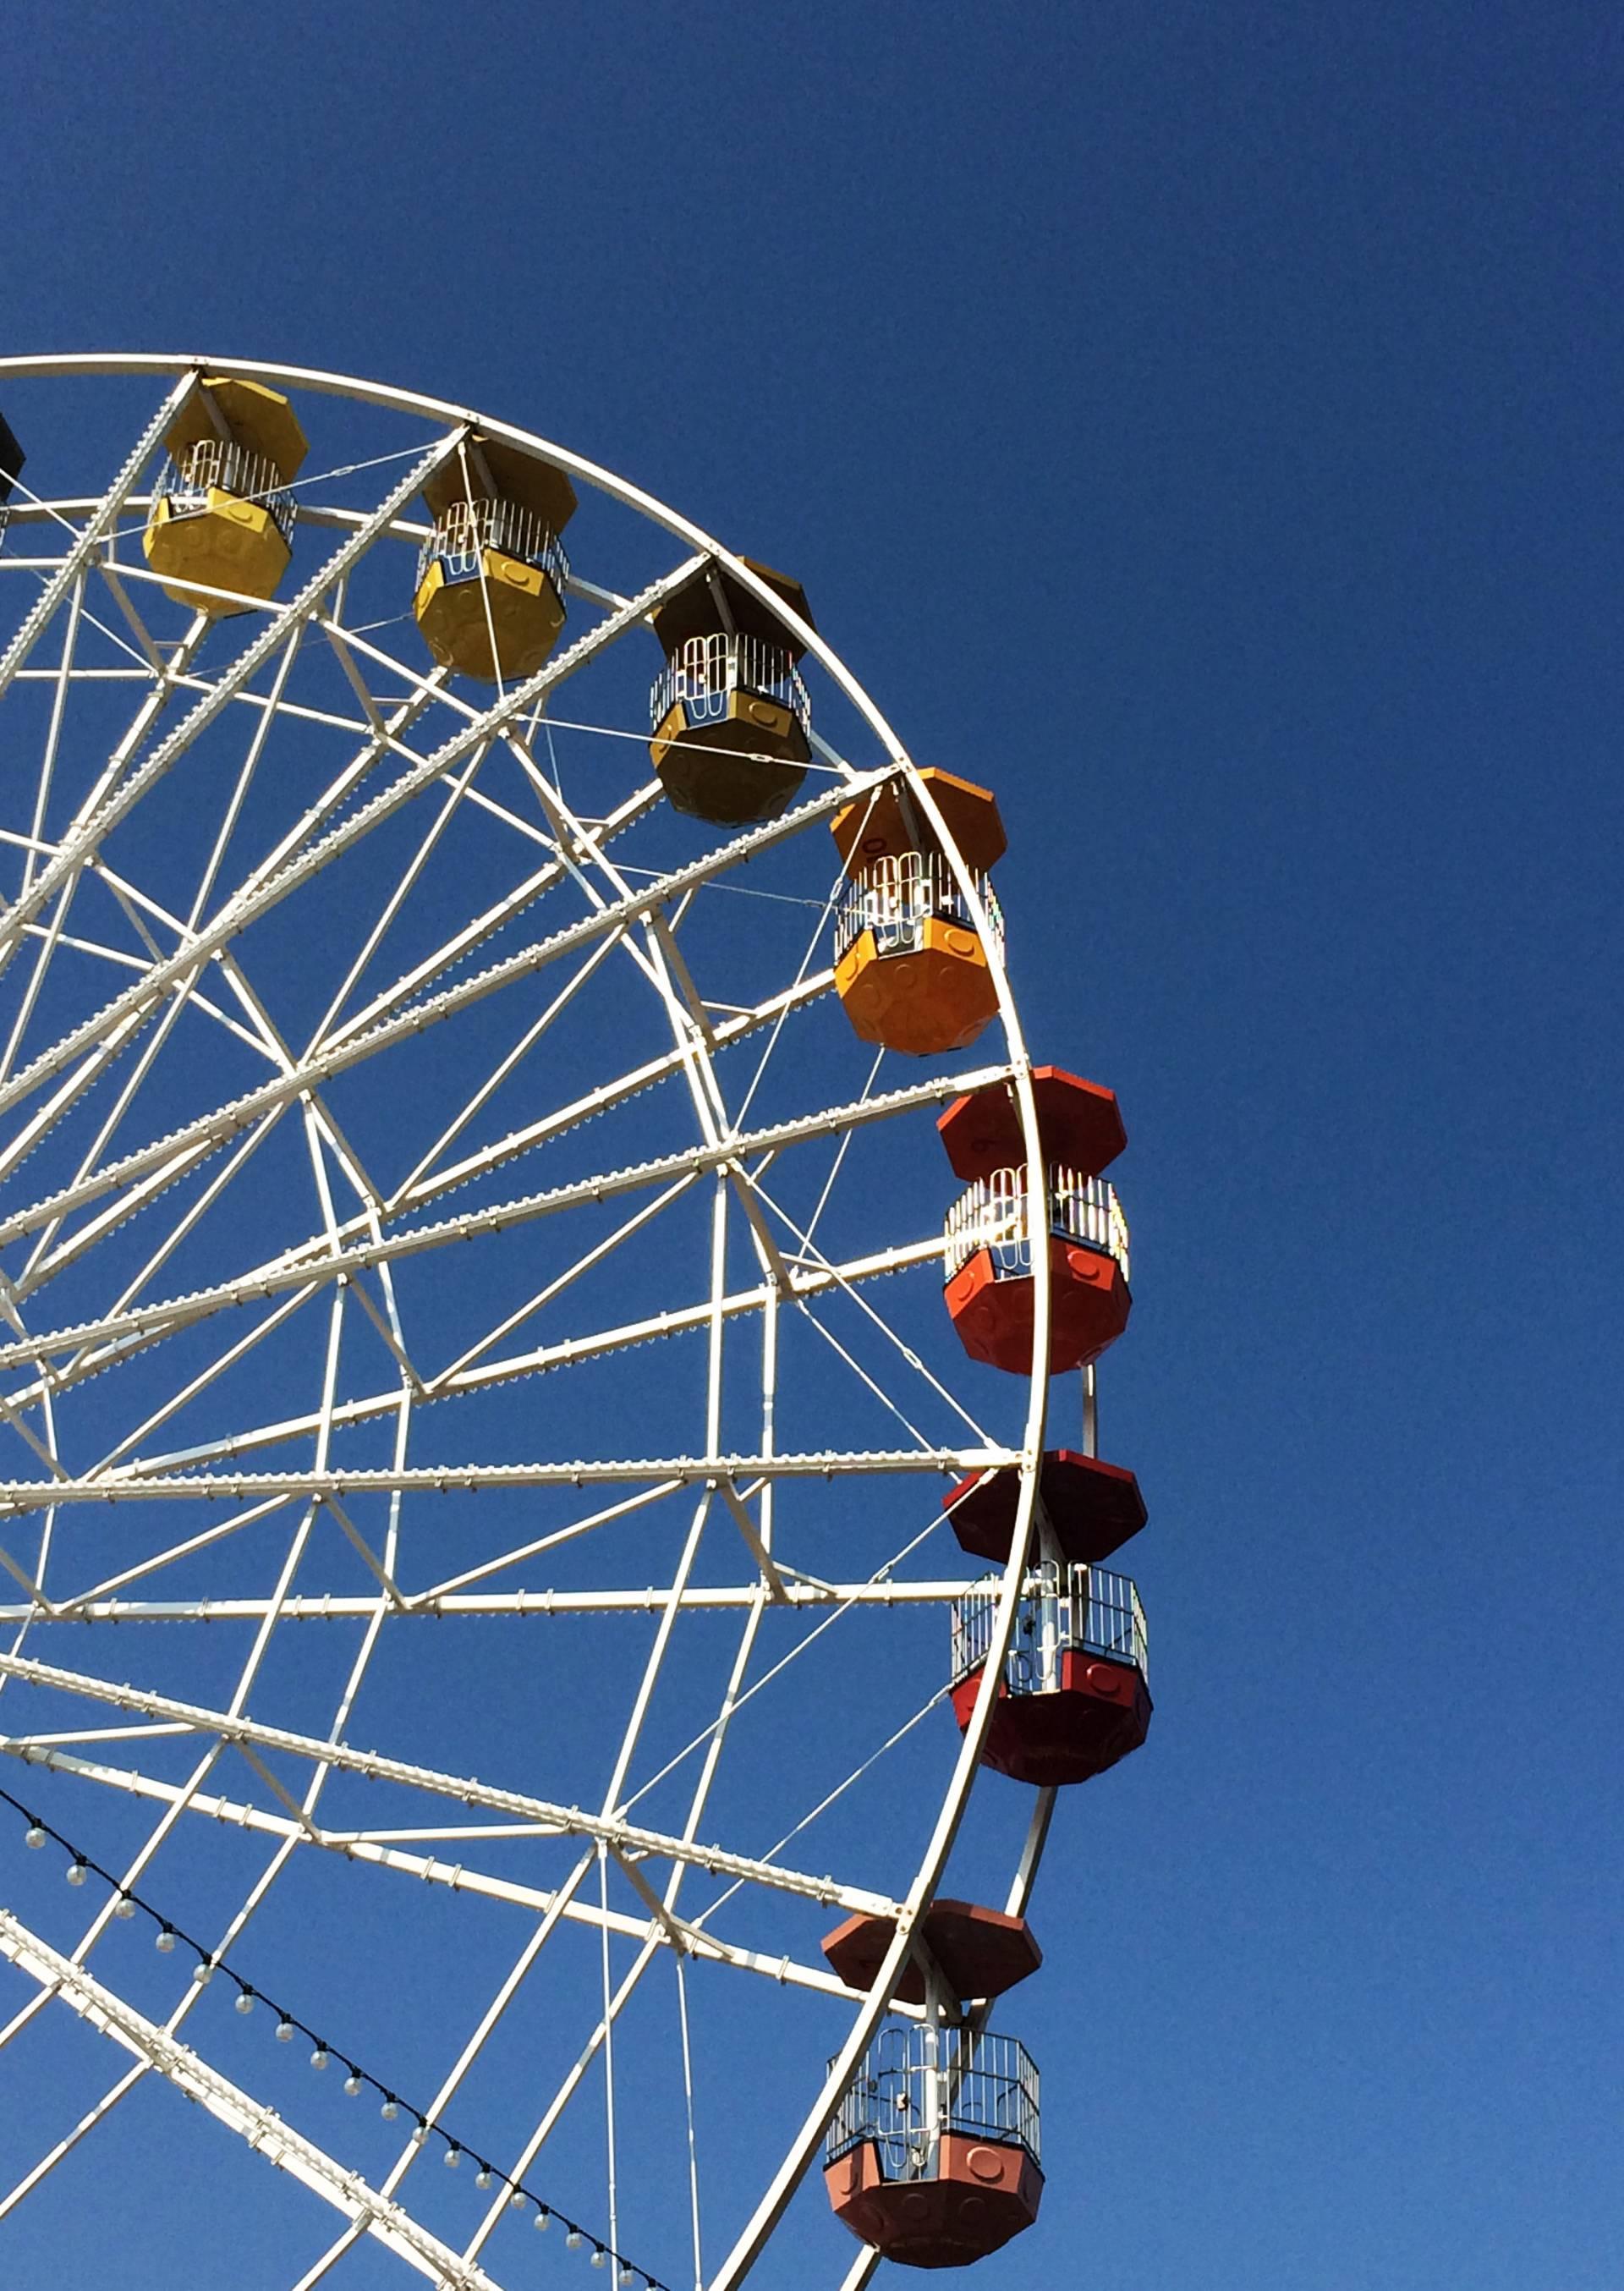 Fairground Margate Dreamland